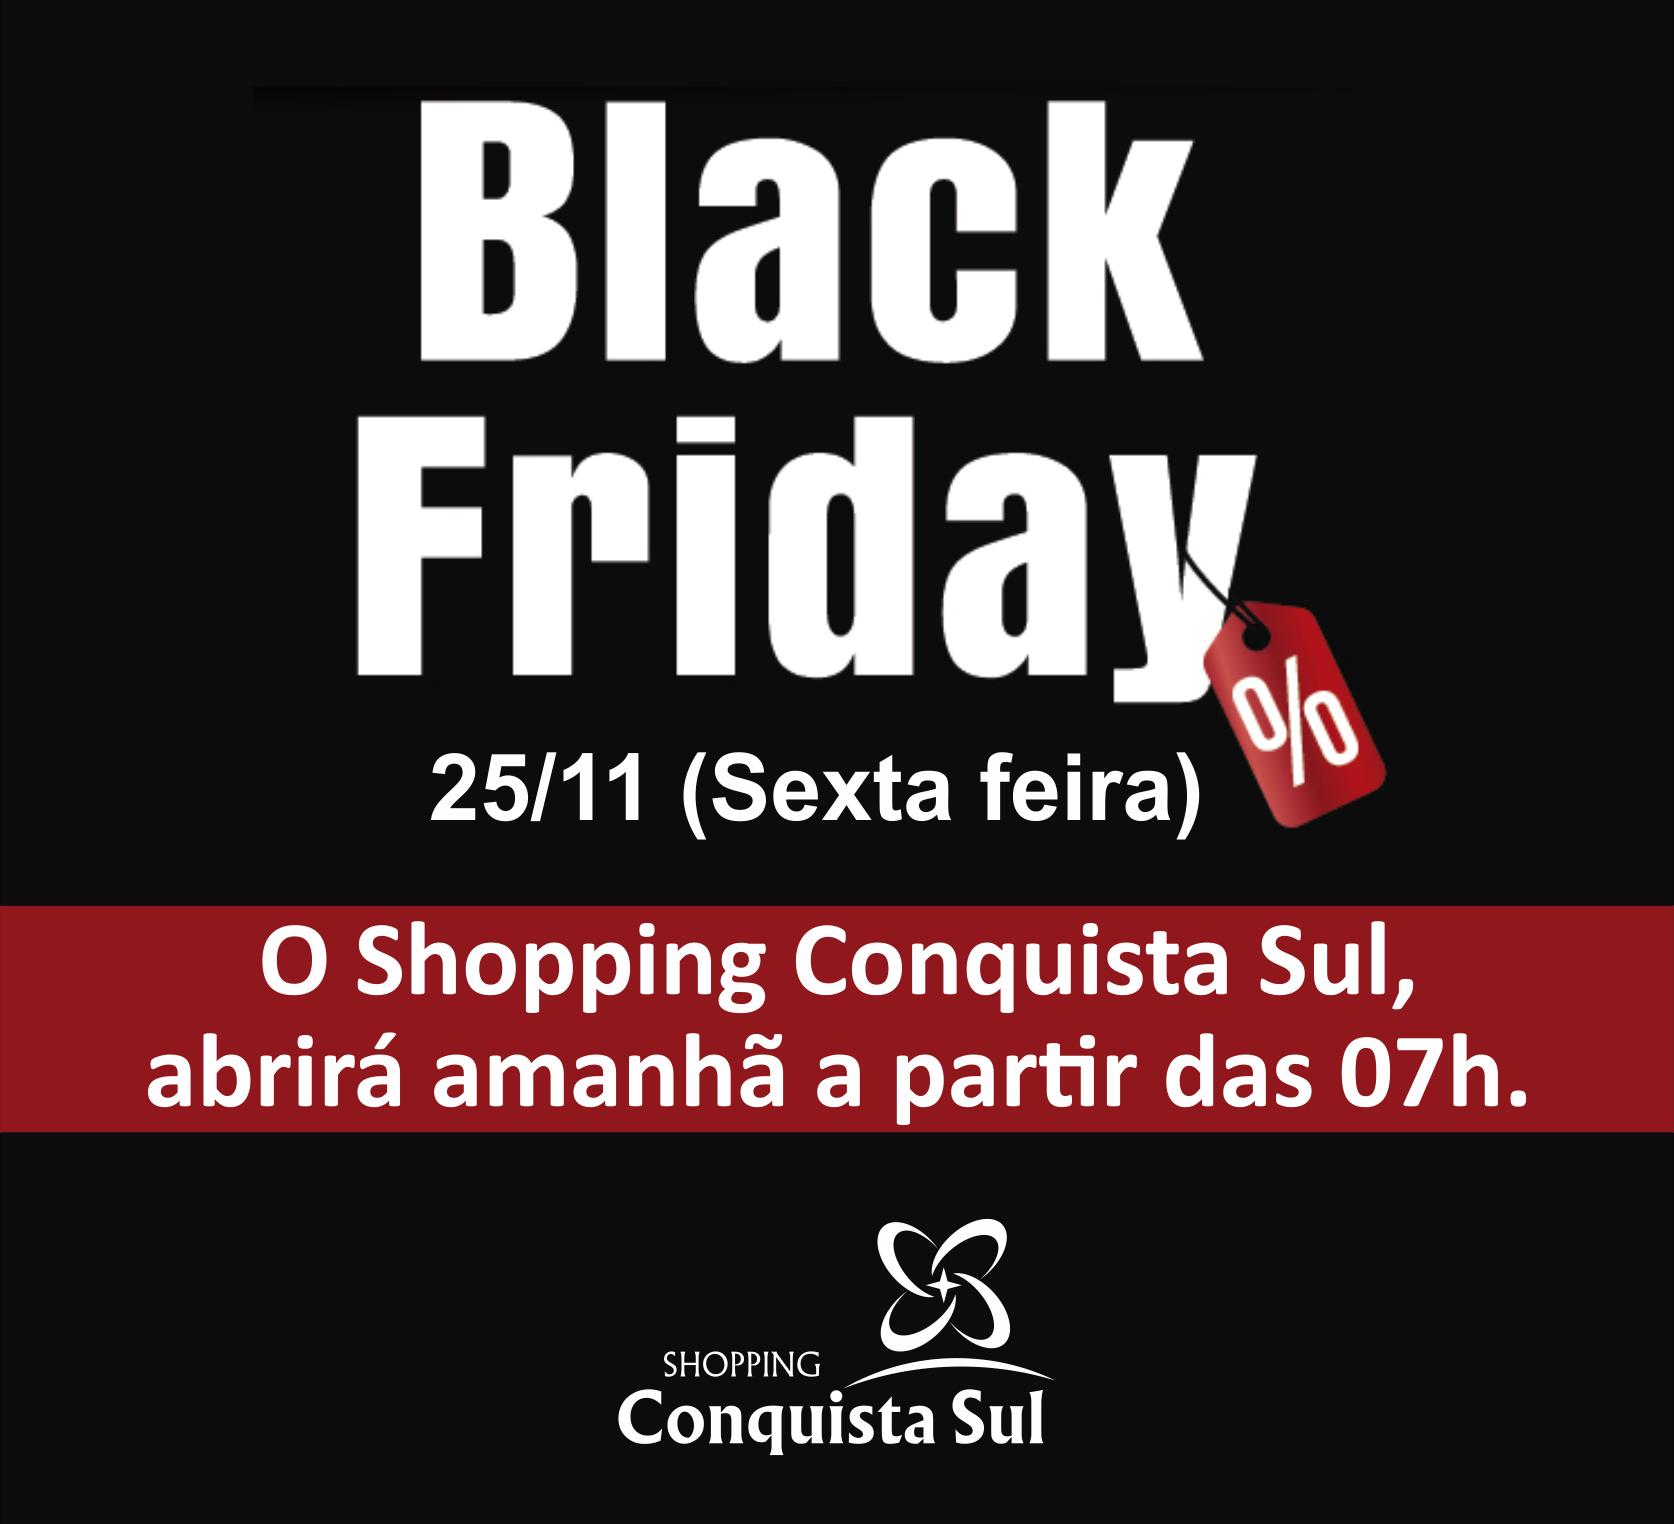 horario_blackfriday